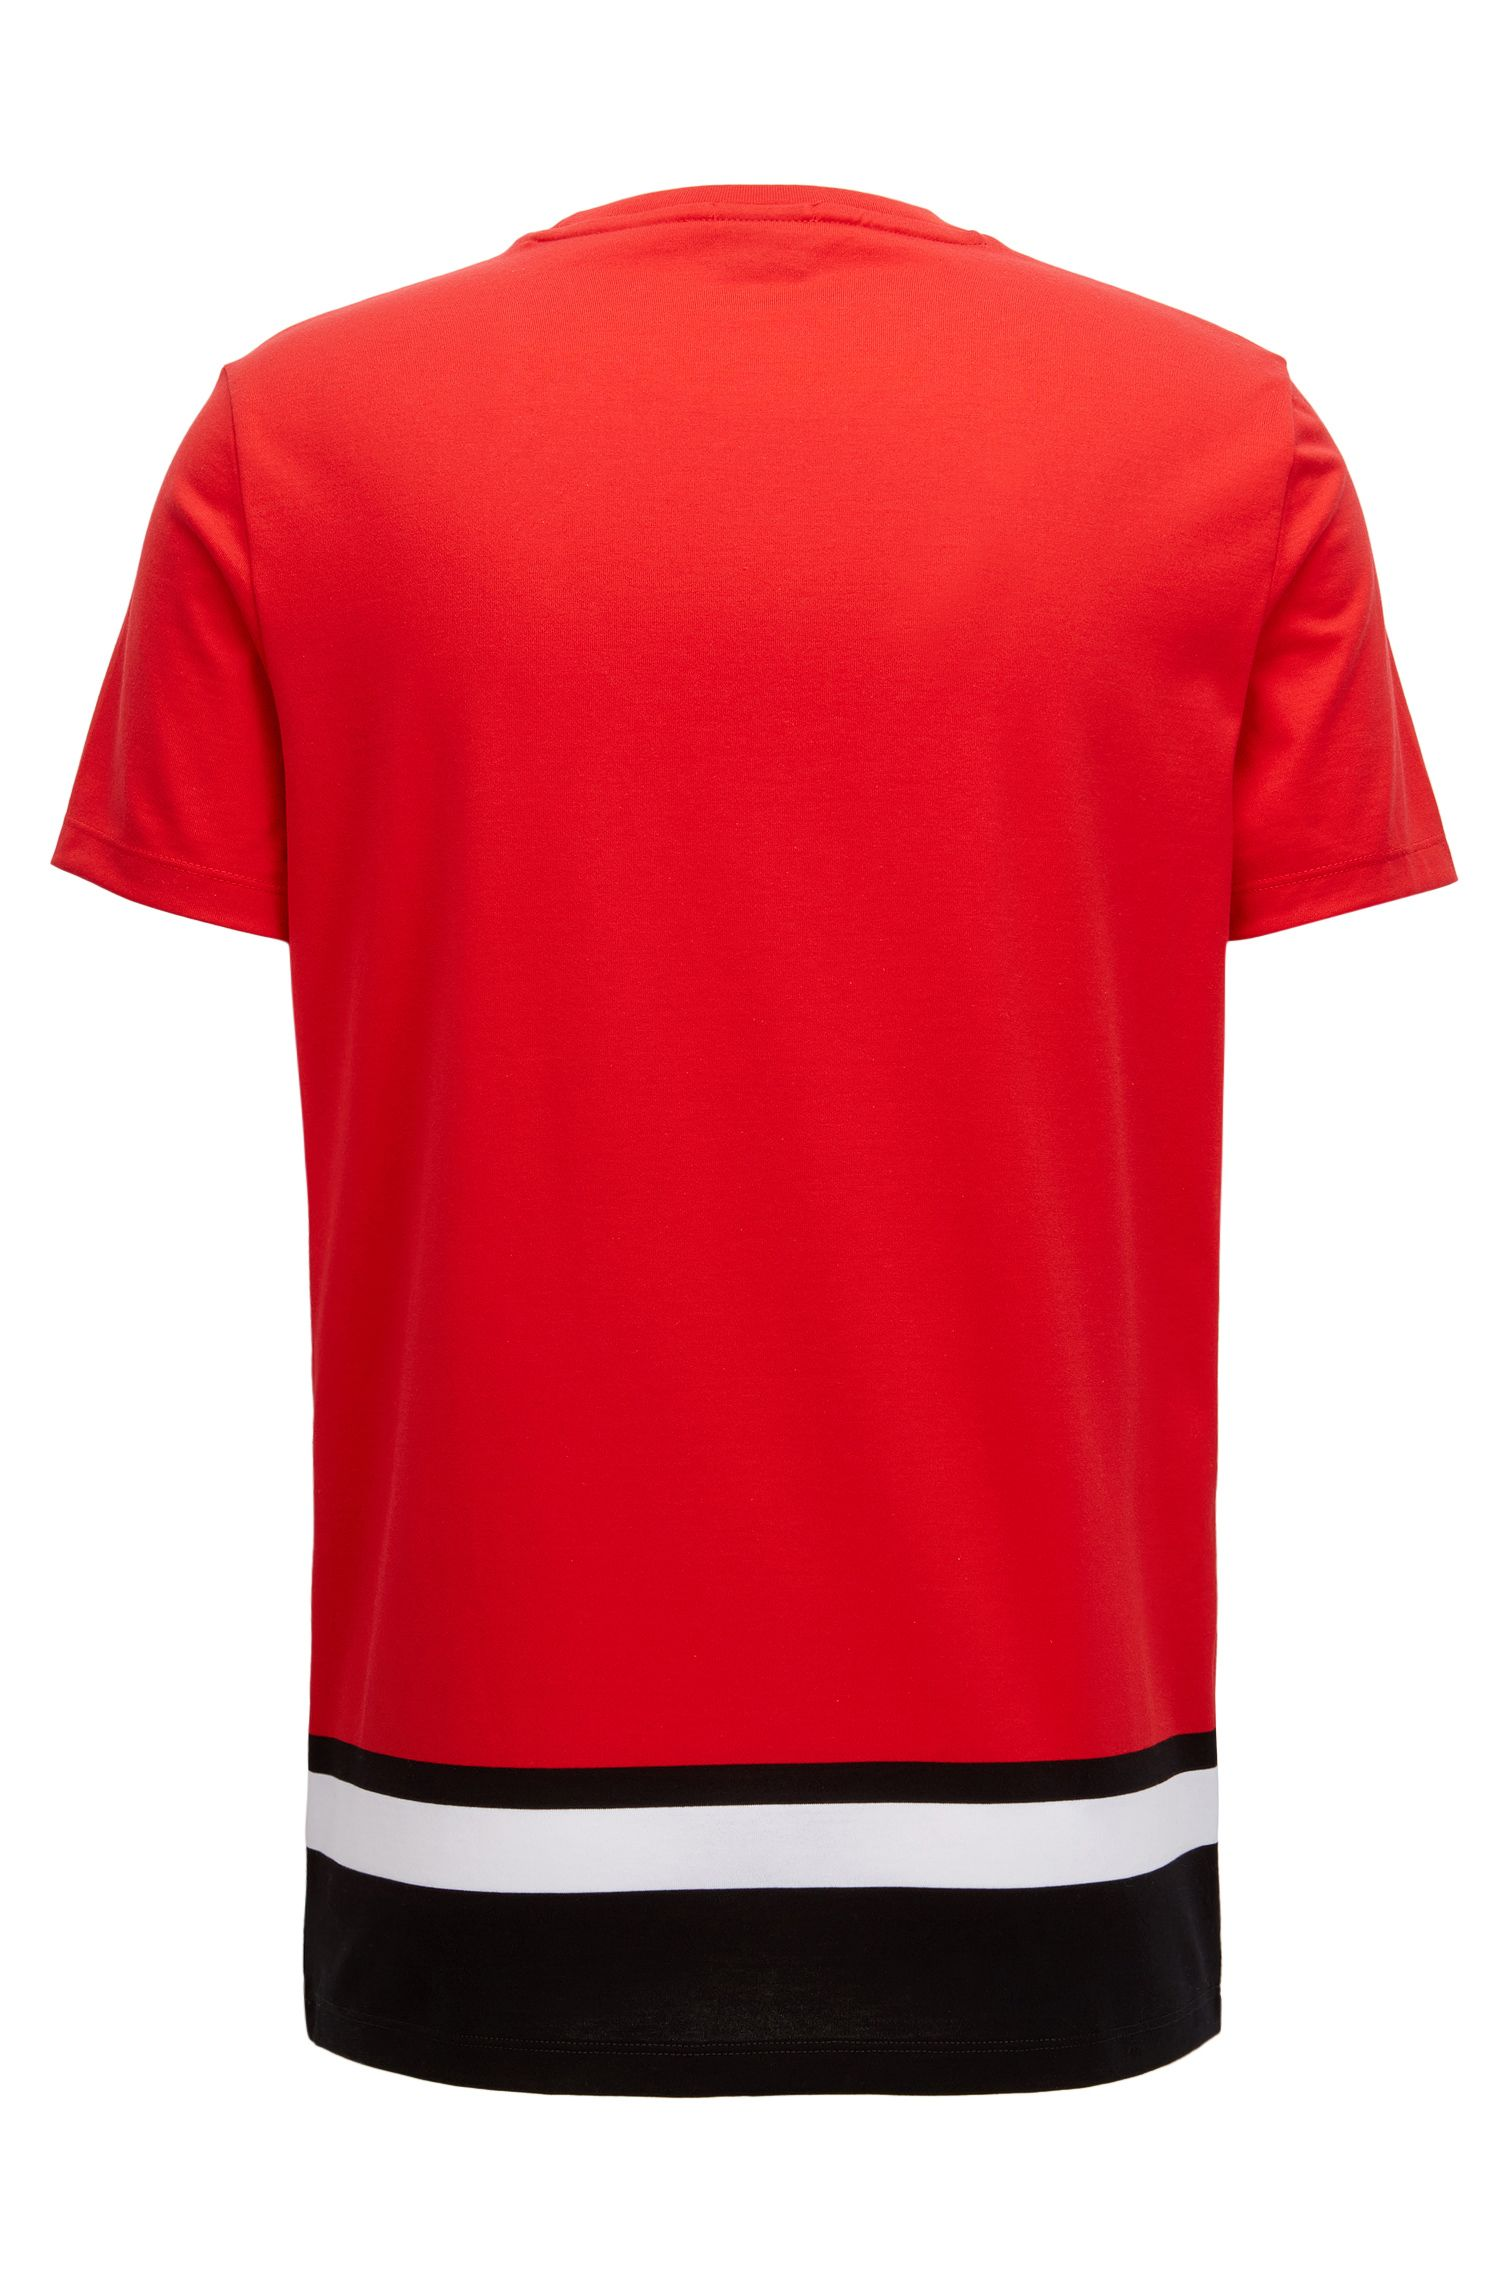 Colorblocked T-Shirt | Tiburt